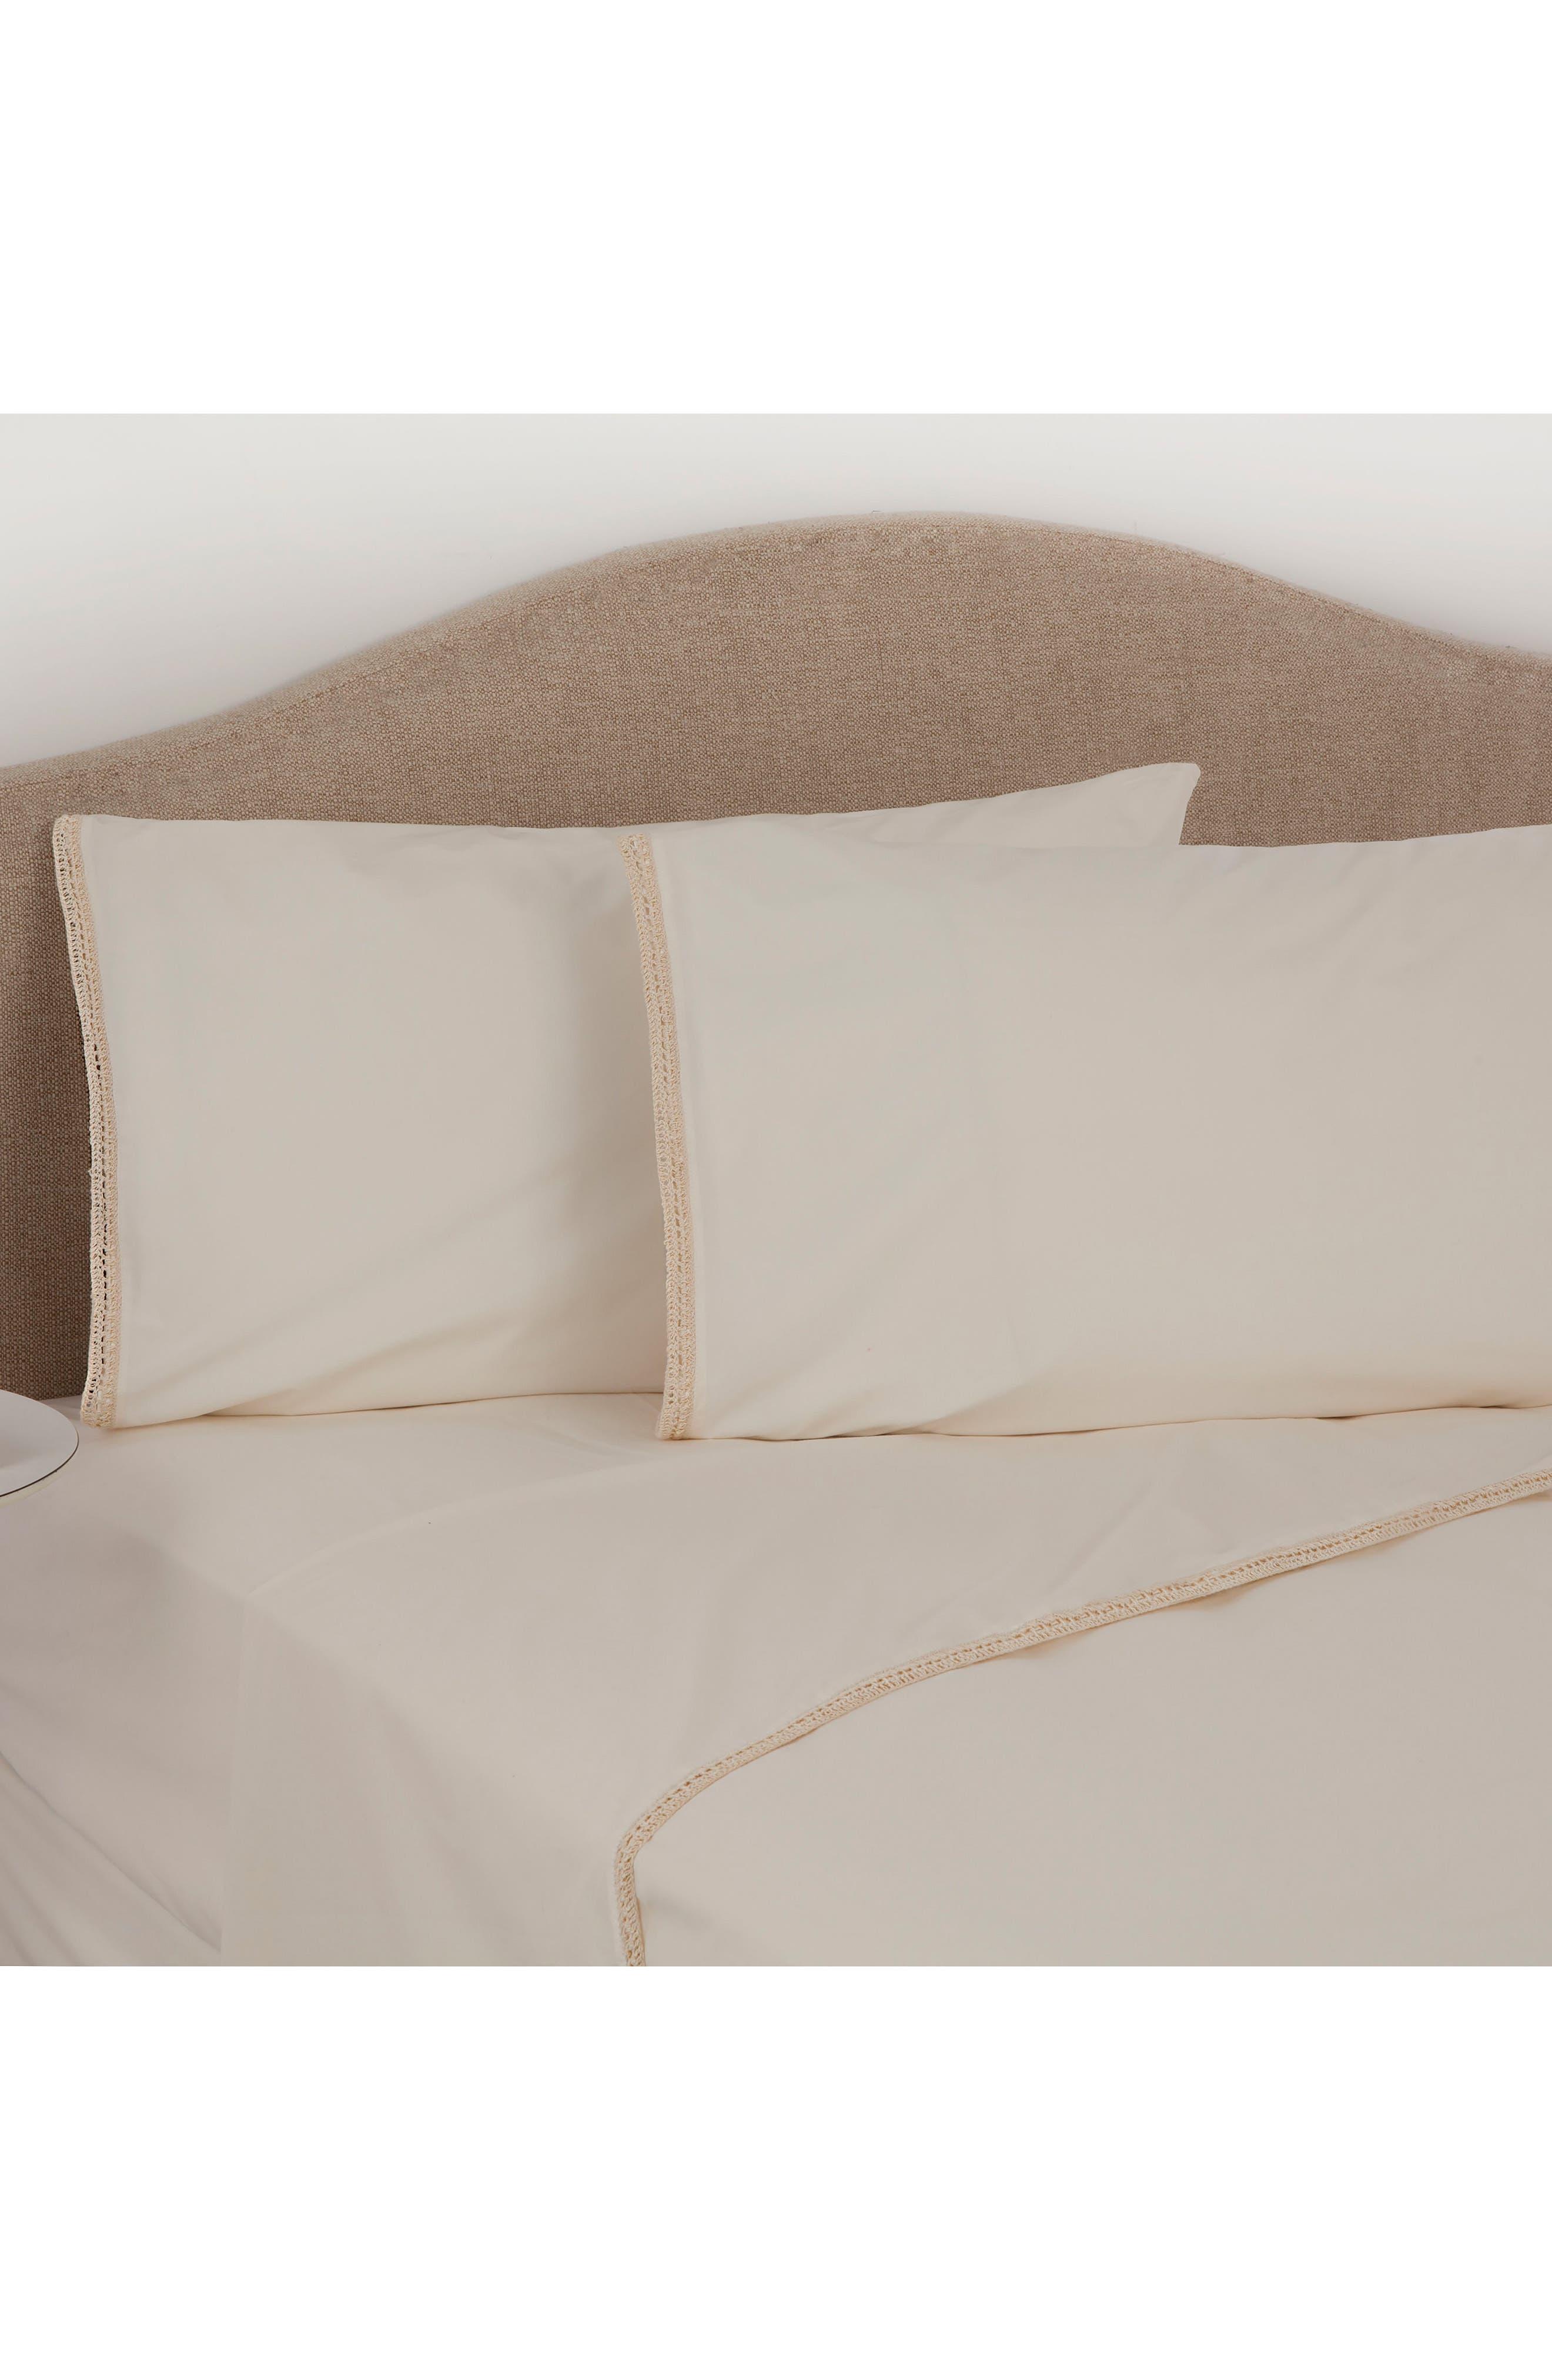 Crochet Trim Organic Cotton Flat Sheet,                         Main,                         color, Soft Cream